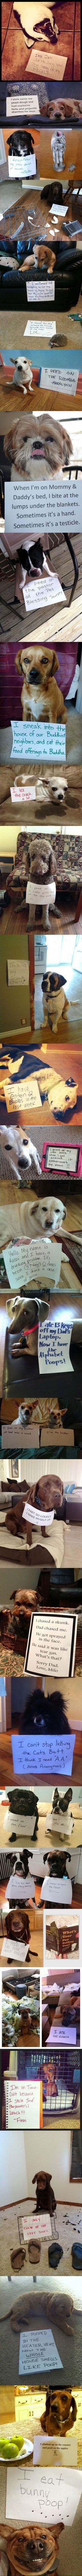 Dog Confessions...